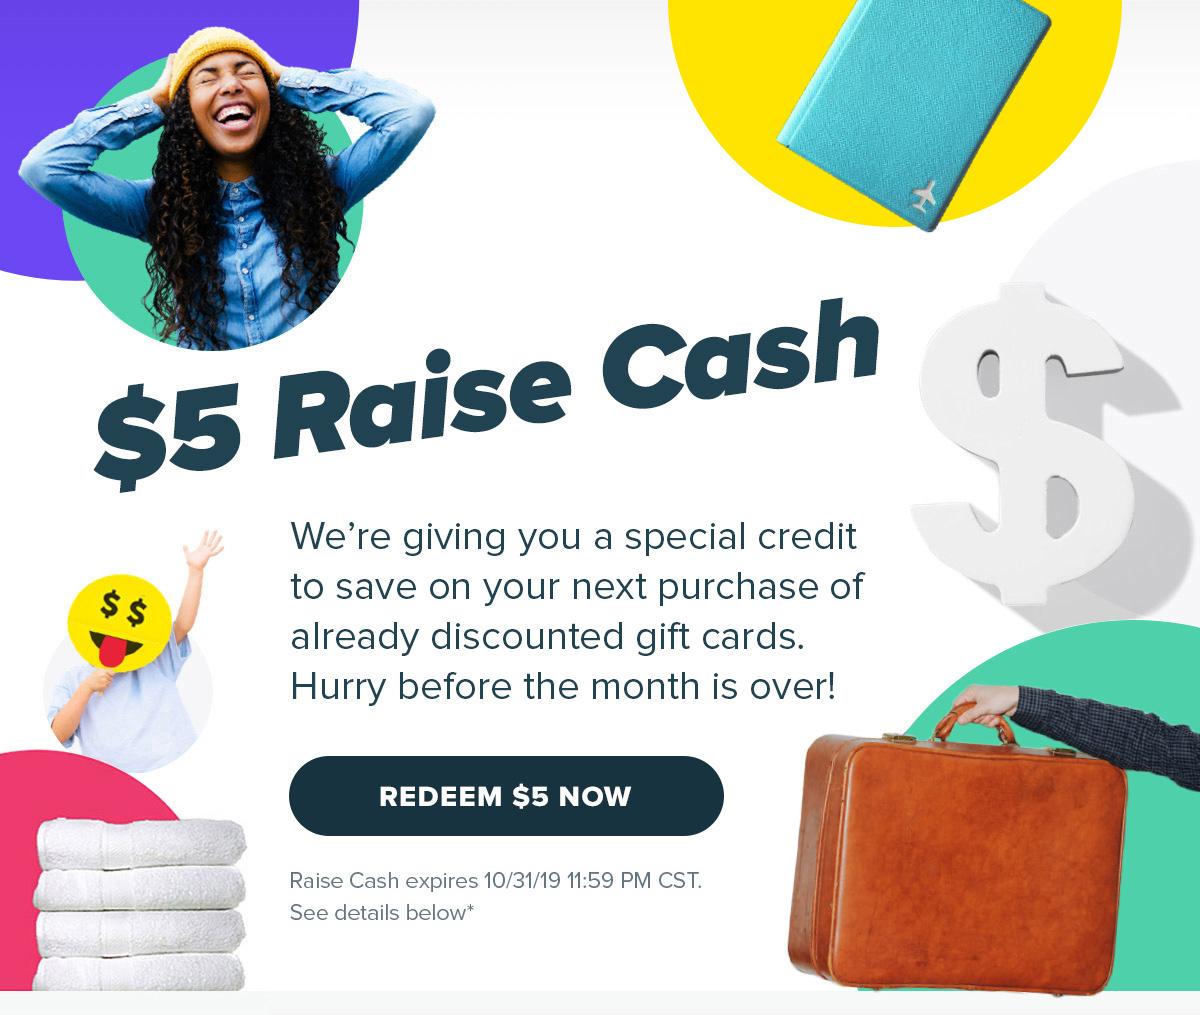 Raise Free $5 Coupon (Targeted)